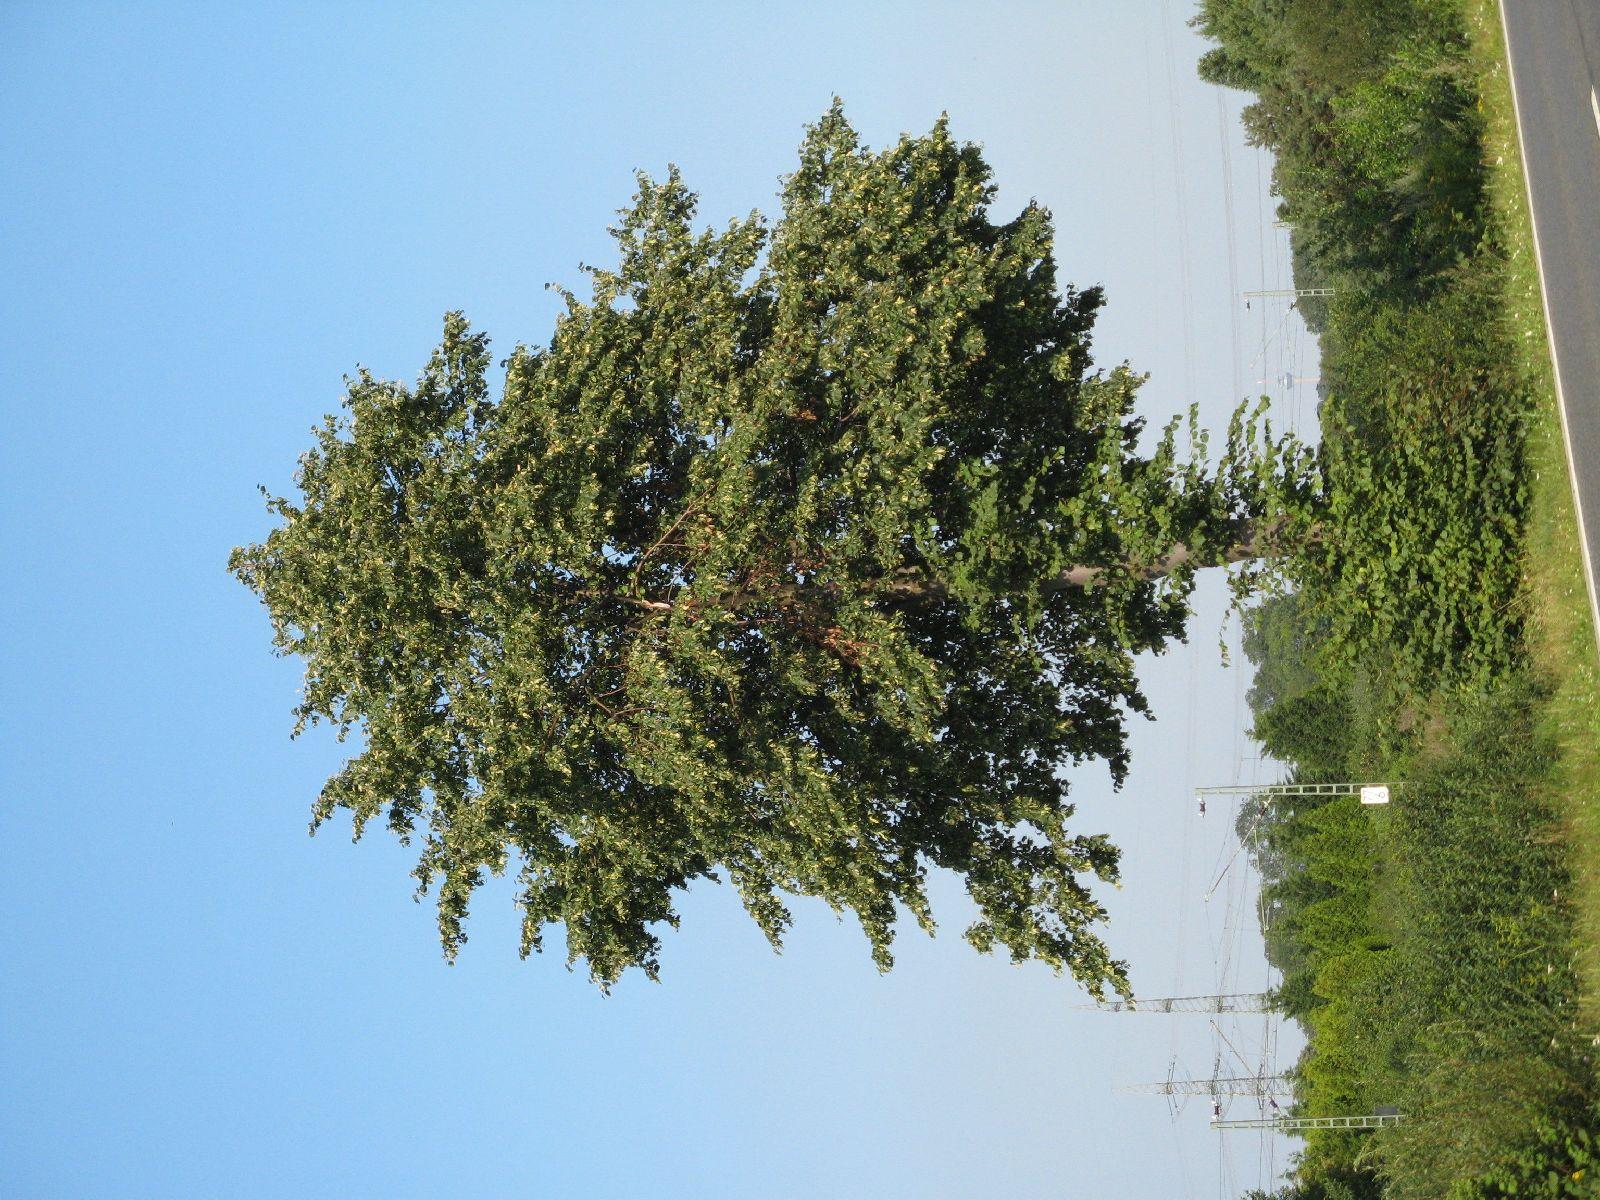 Plants-Trees_Photo_Texture_B_1174